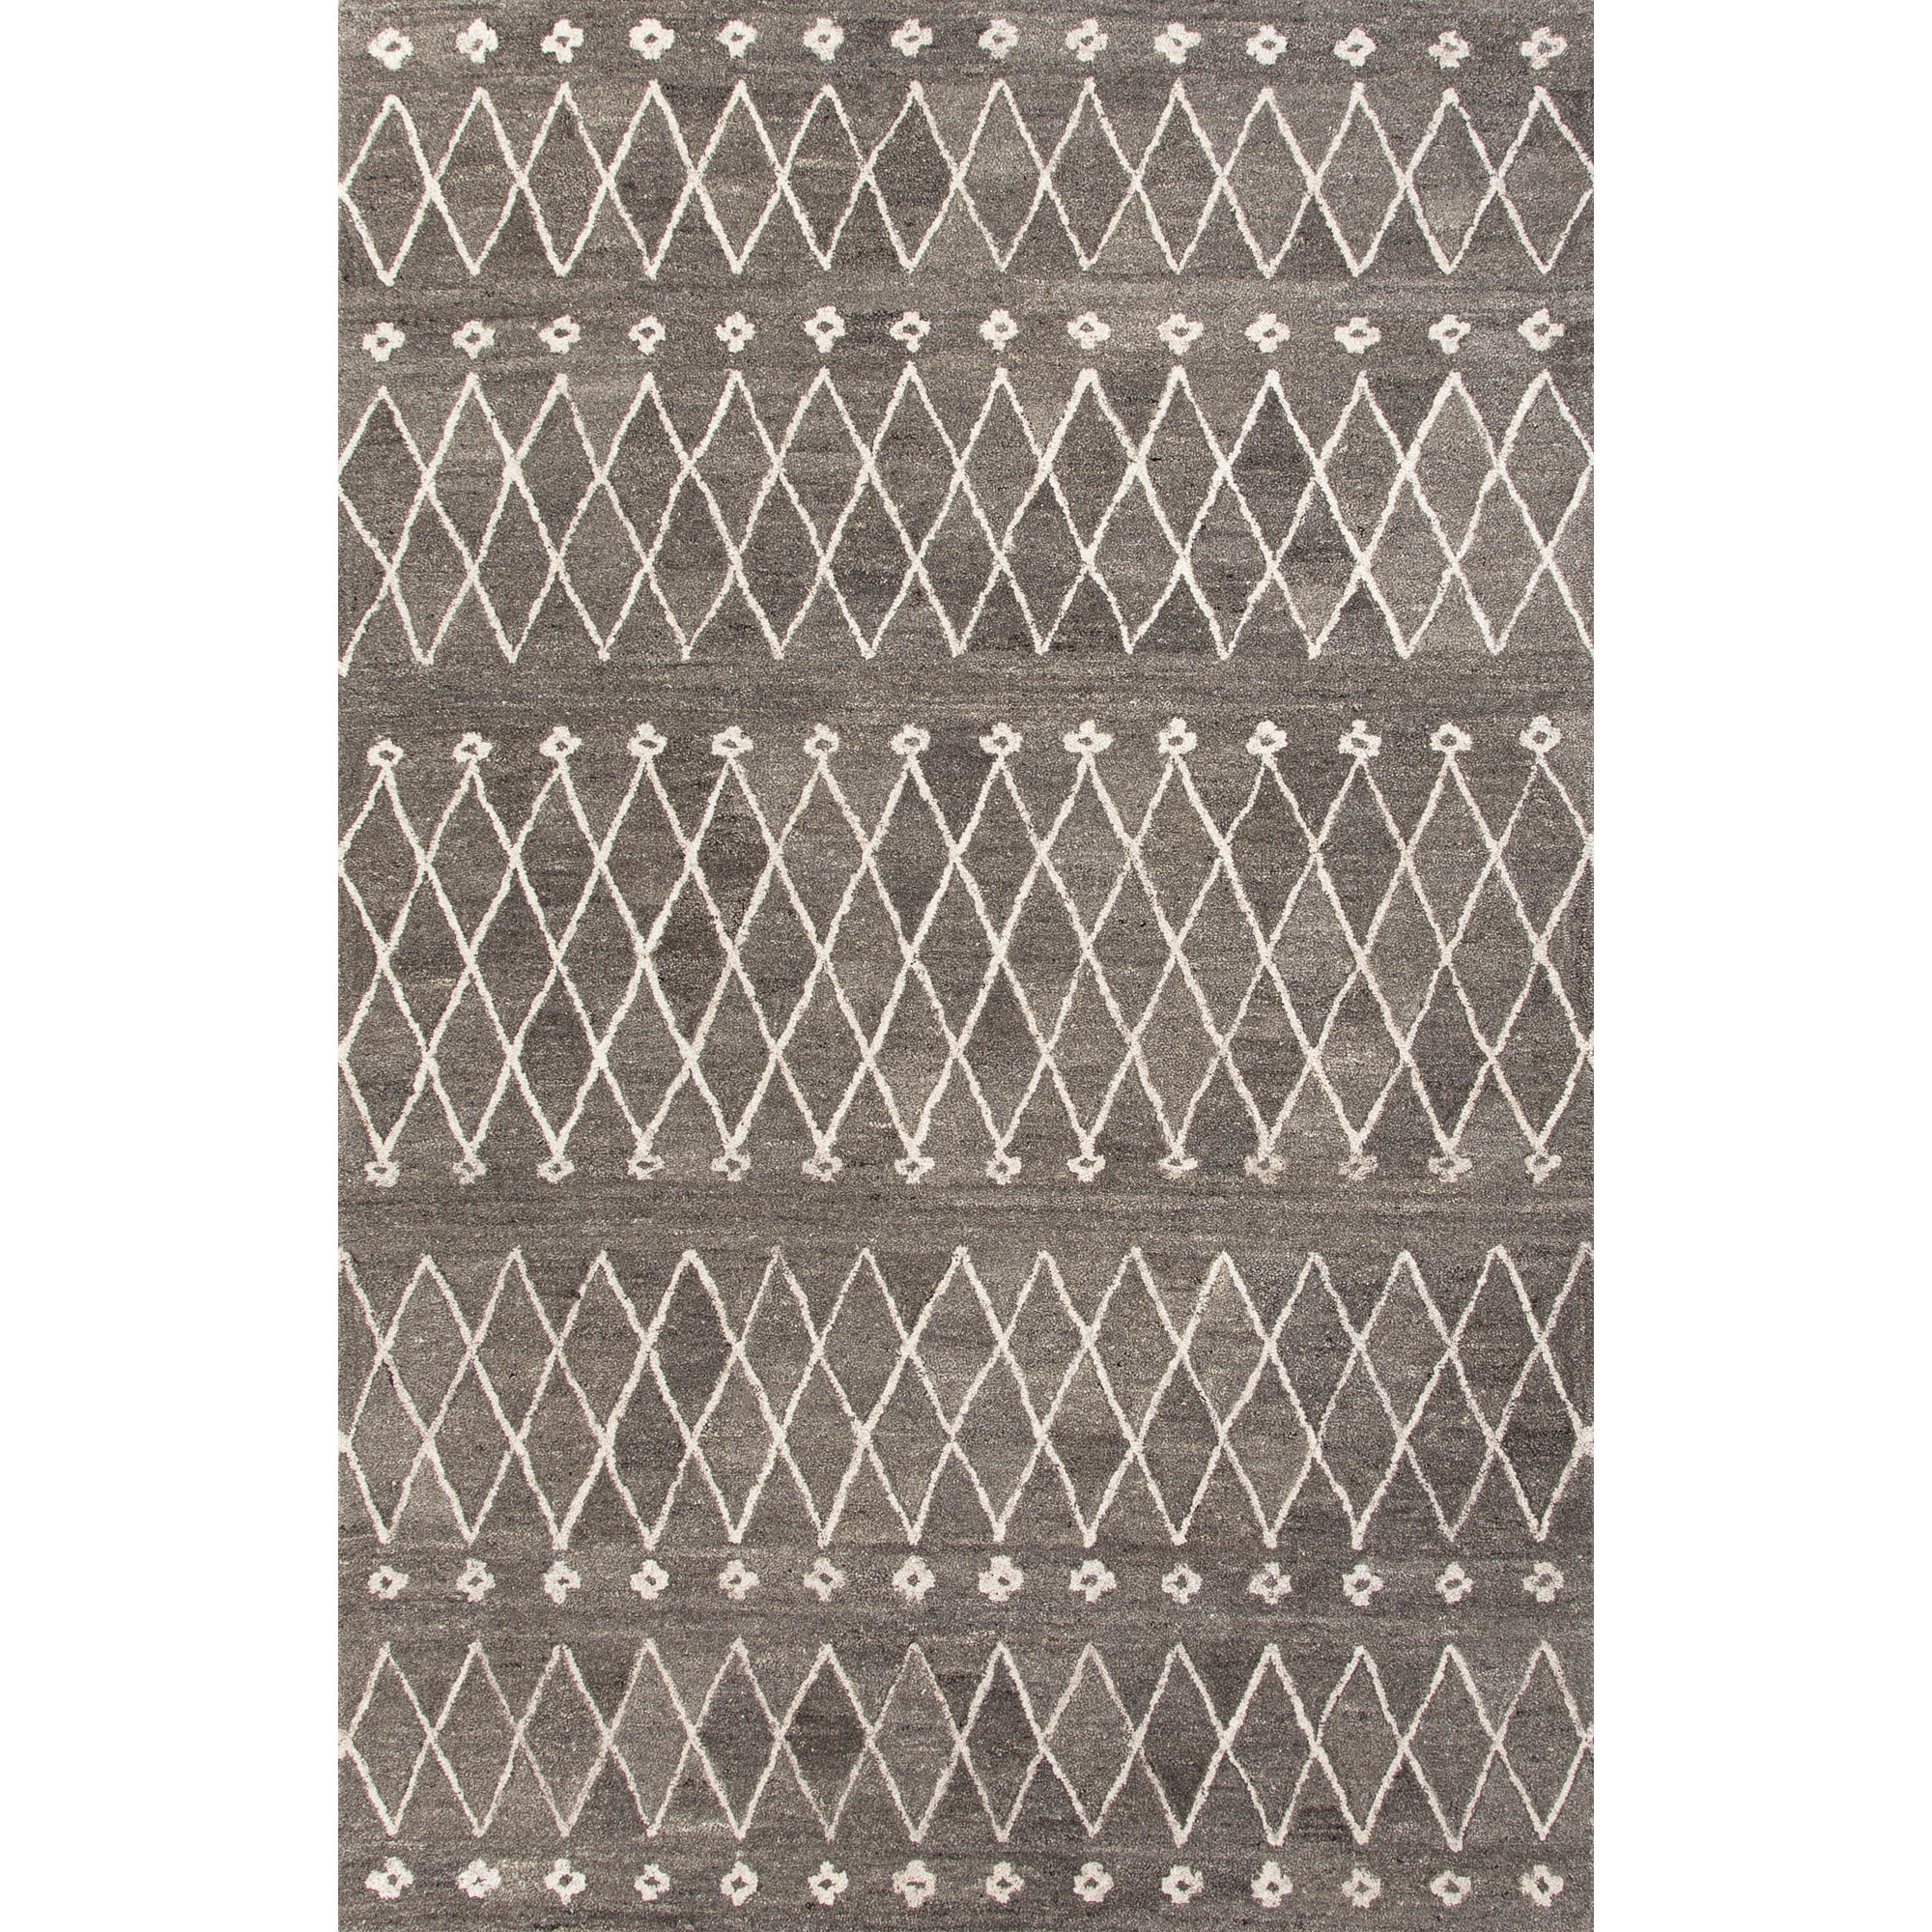 Riad 5 x 8 Rug by JAIPUR Living at Sprintz Furniture